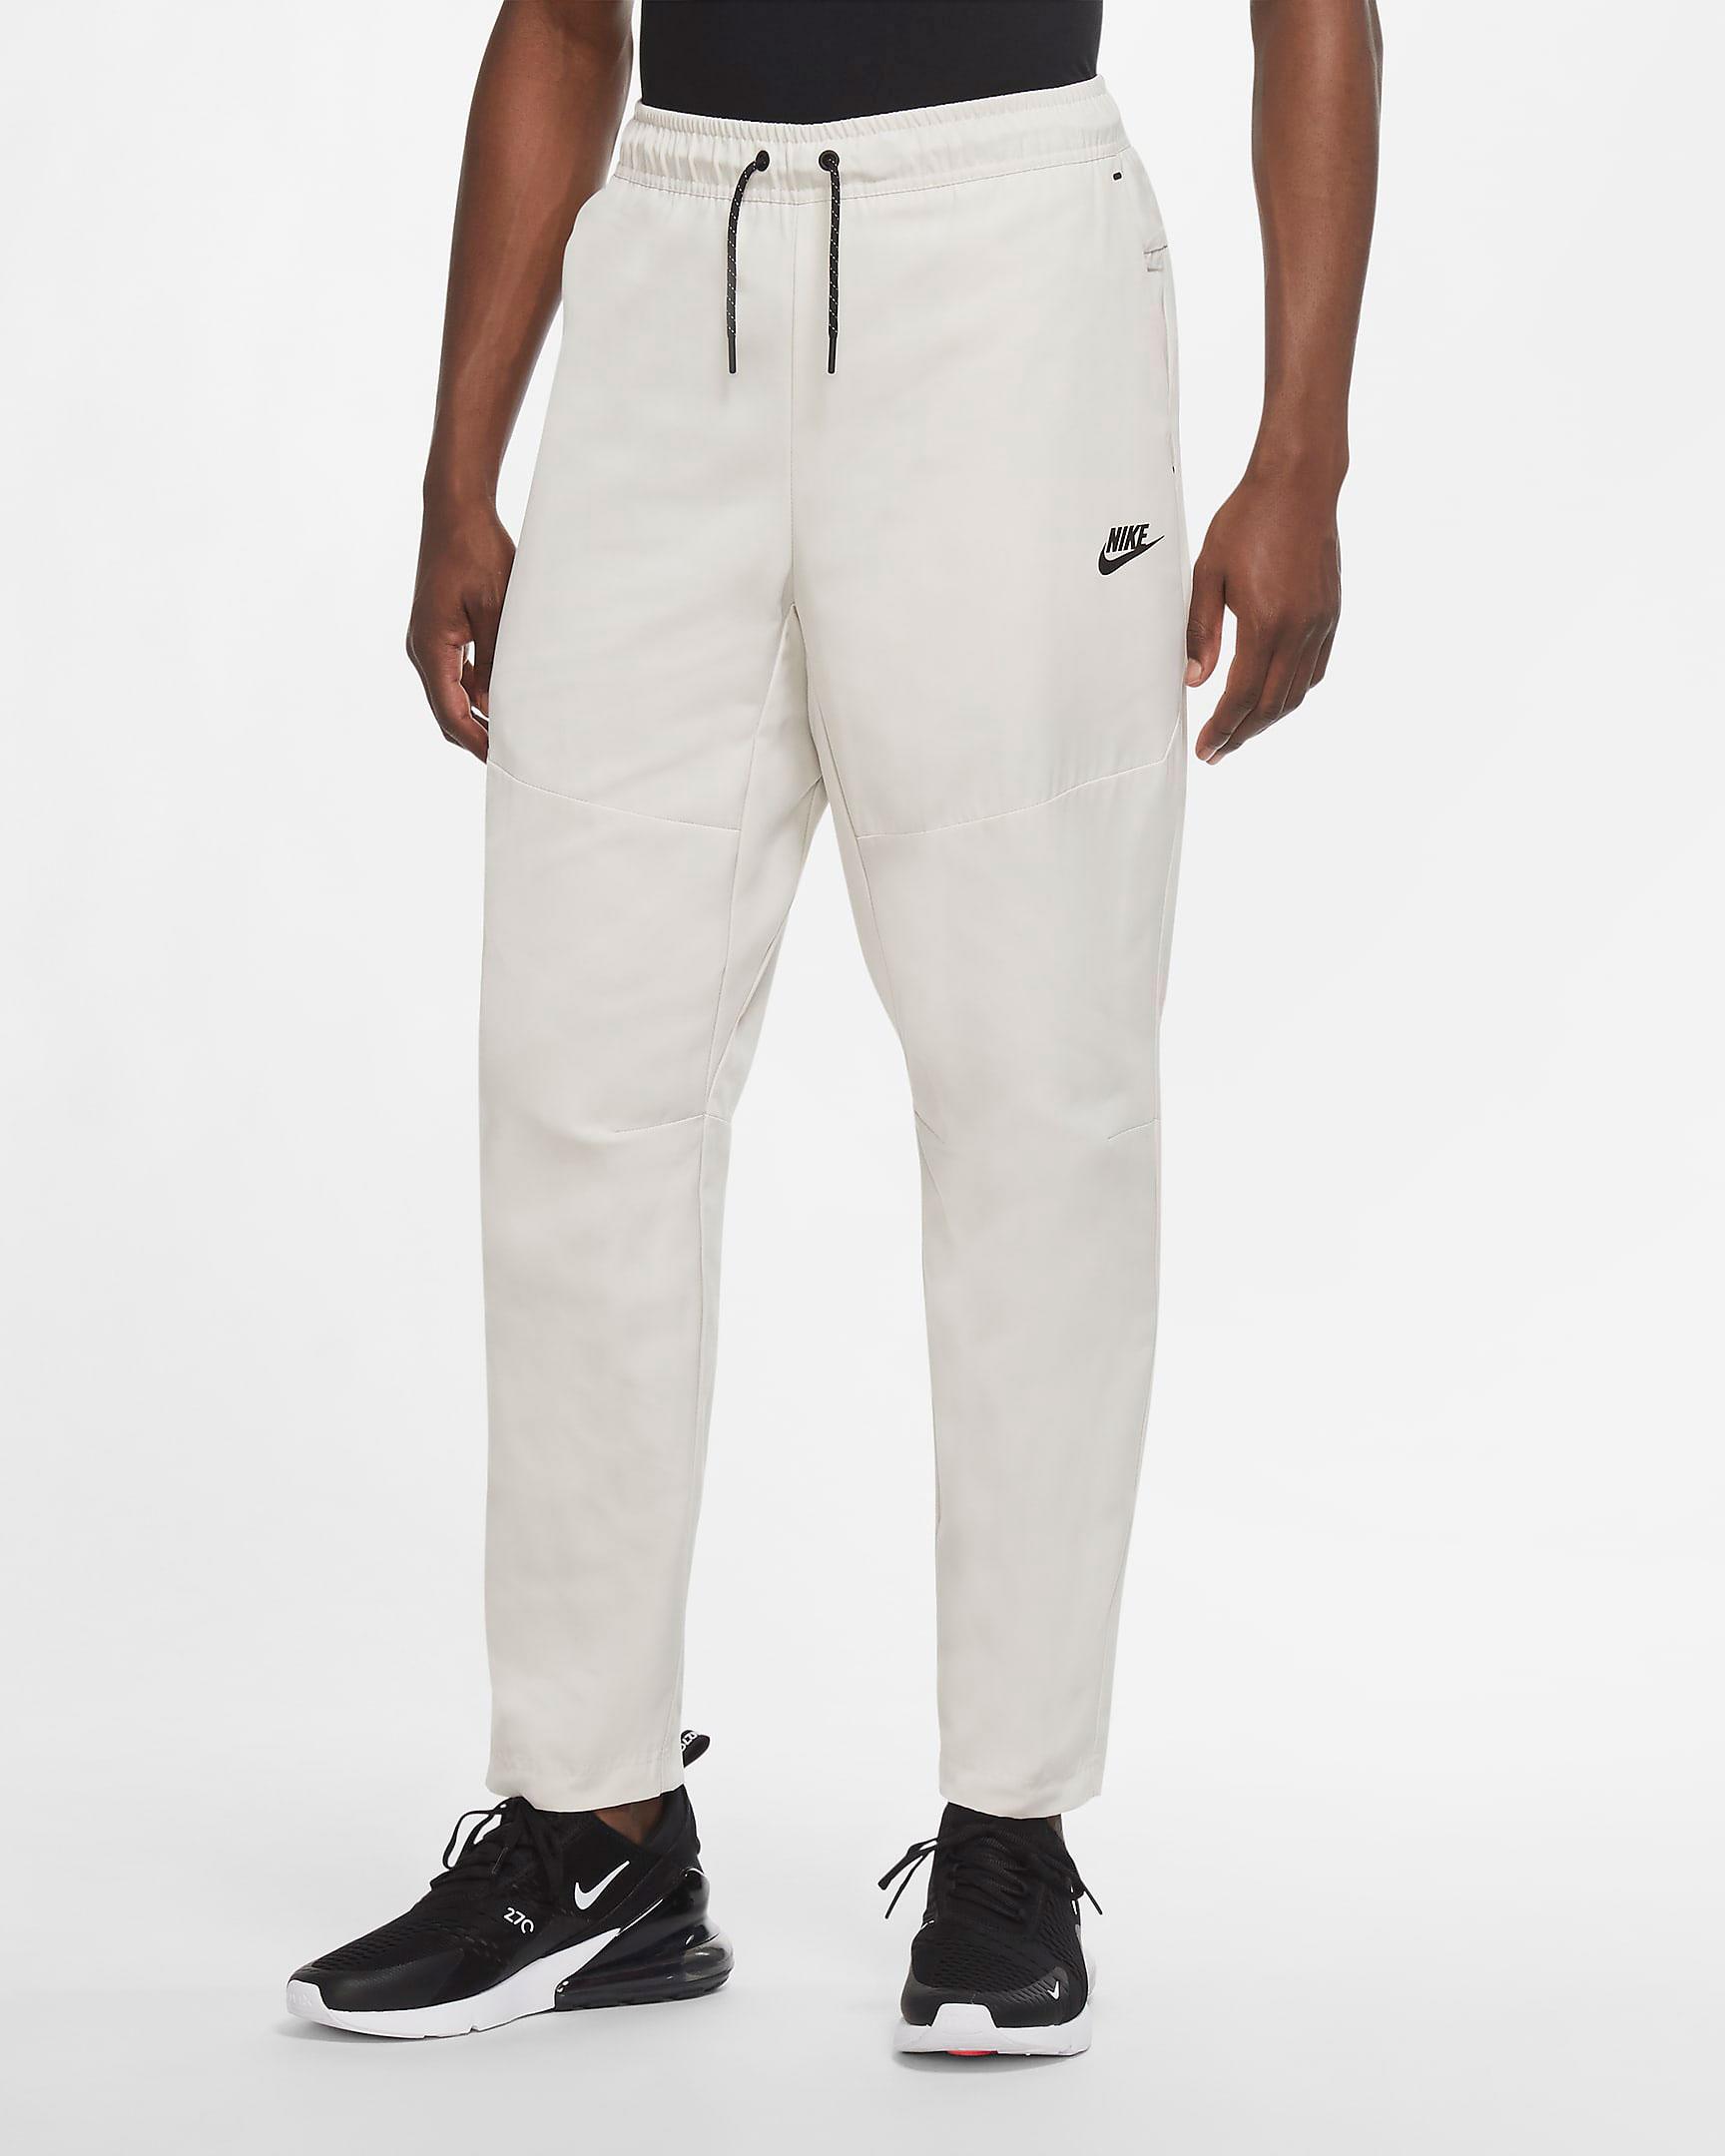 off-white-air-jordan-5-sail-nike-pants-match-1